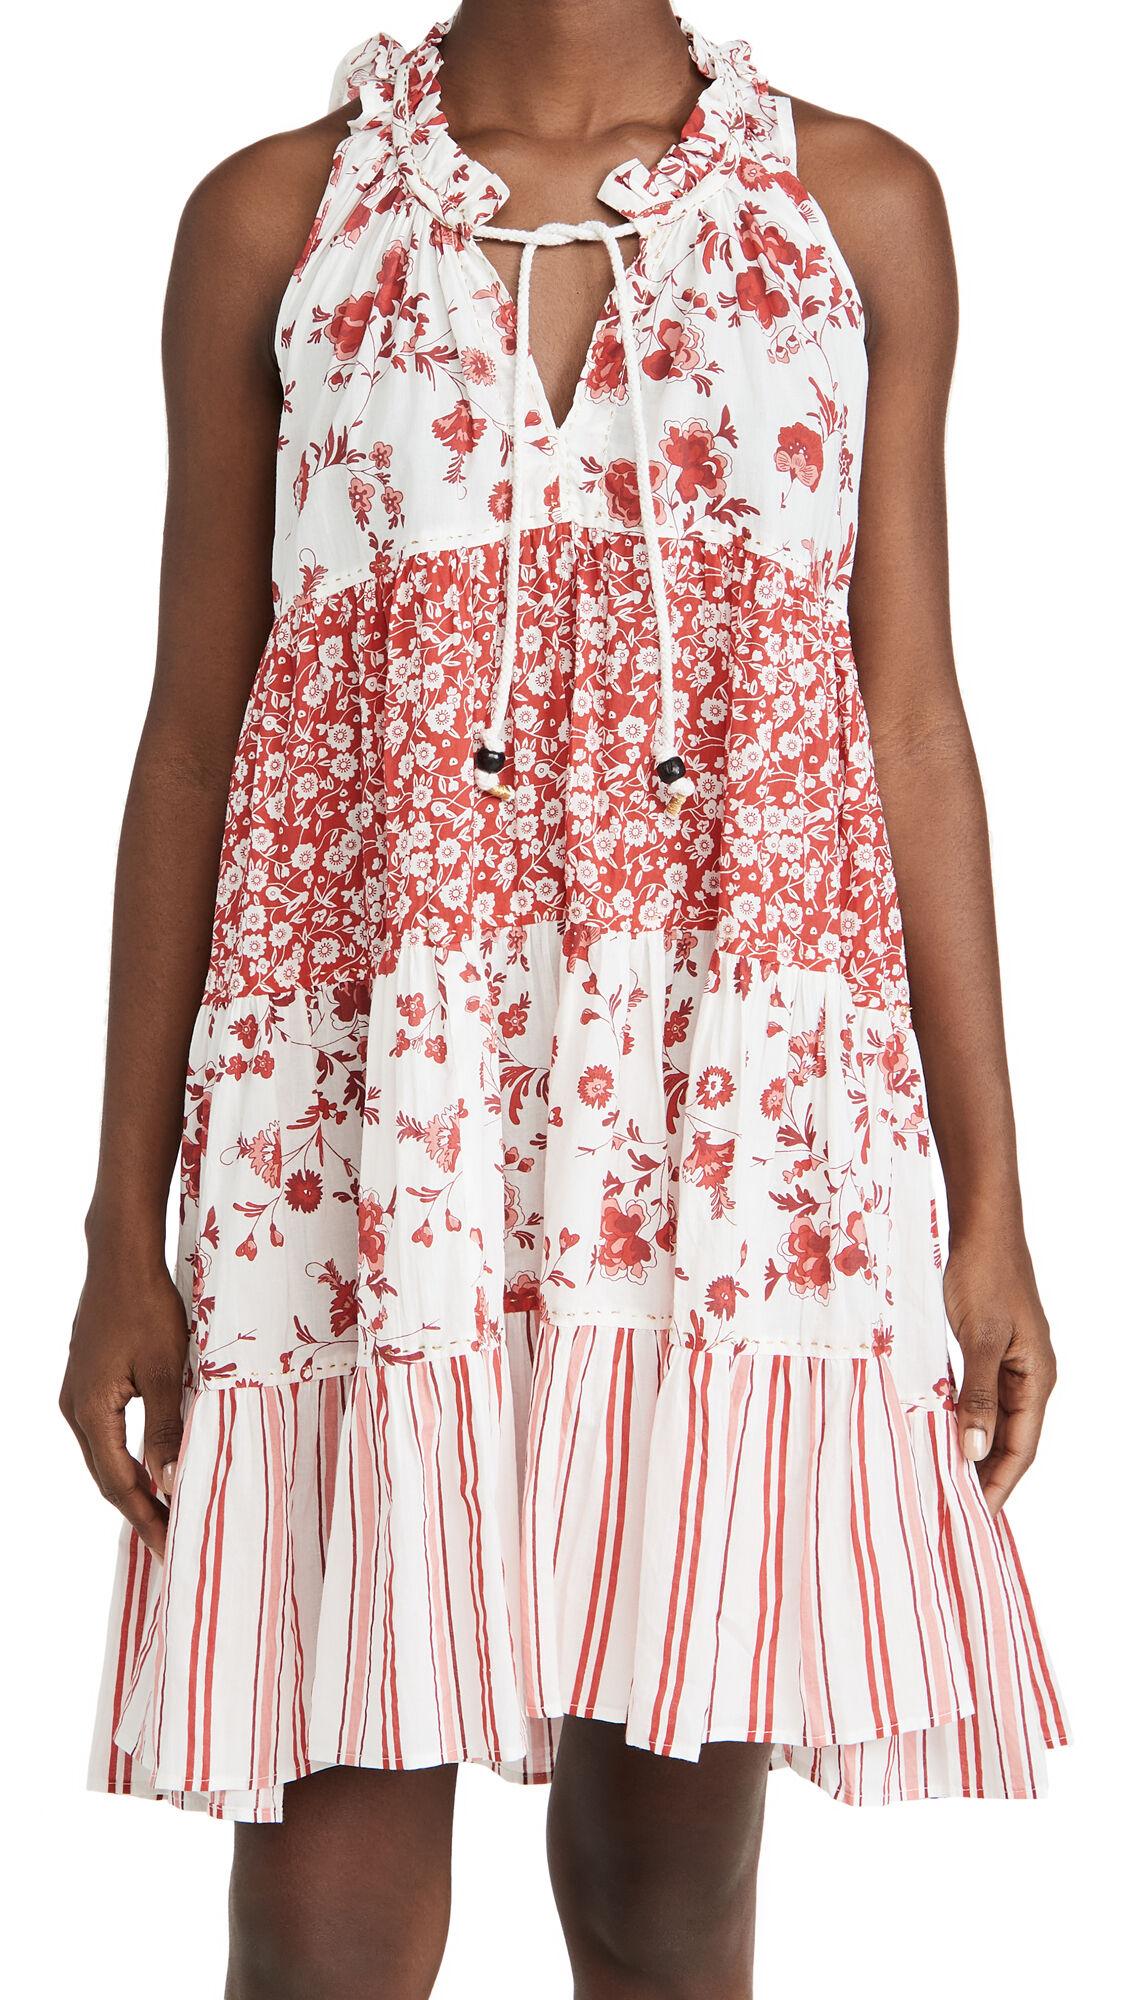 Ro's Garden Sofia Short Dress  - Provence Red - Size: Small